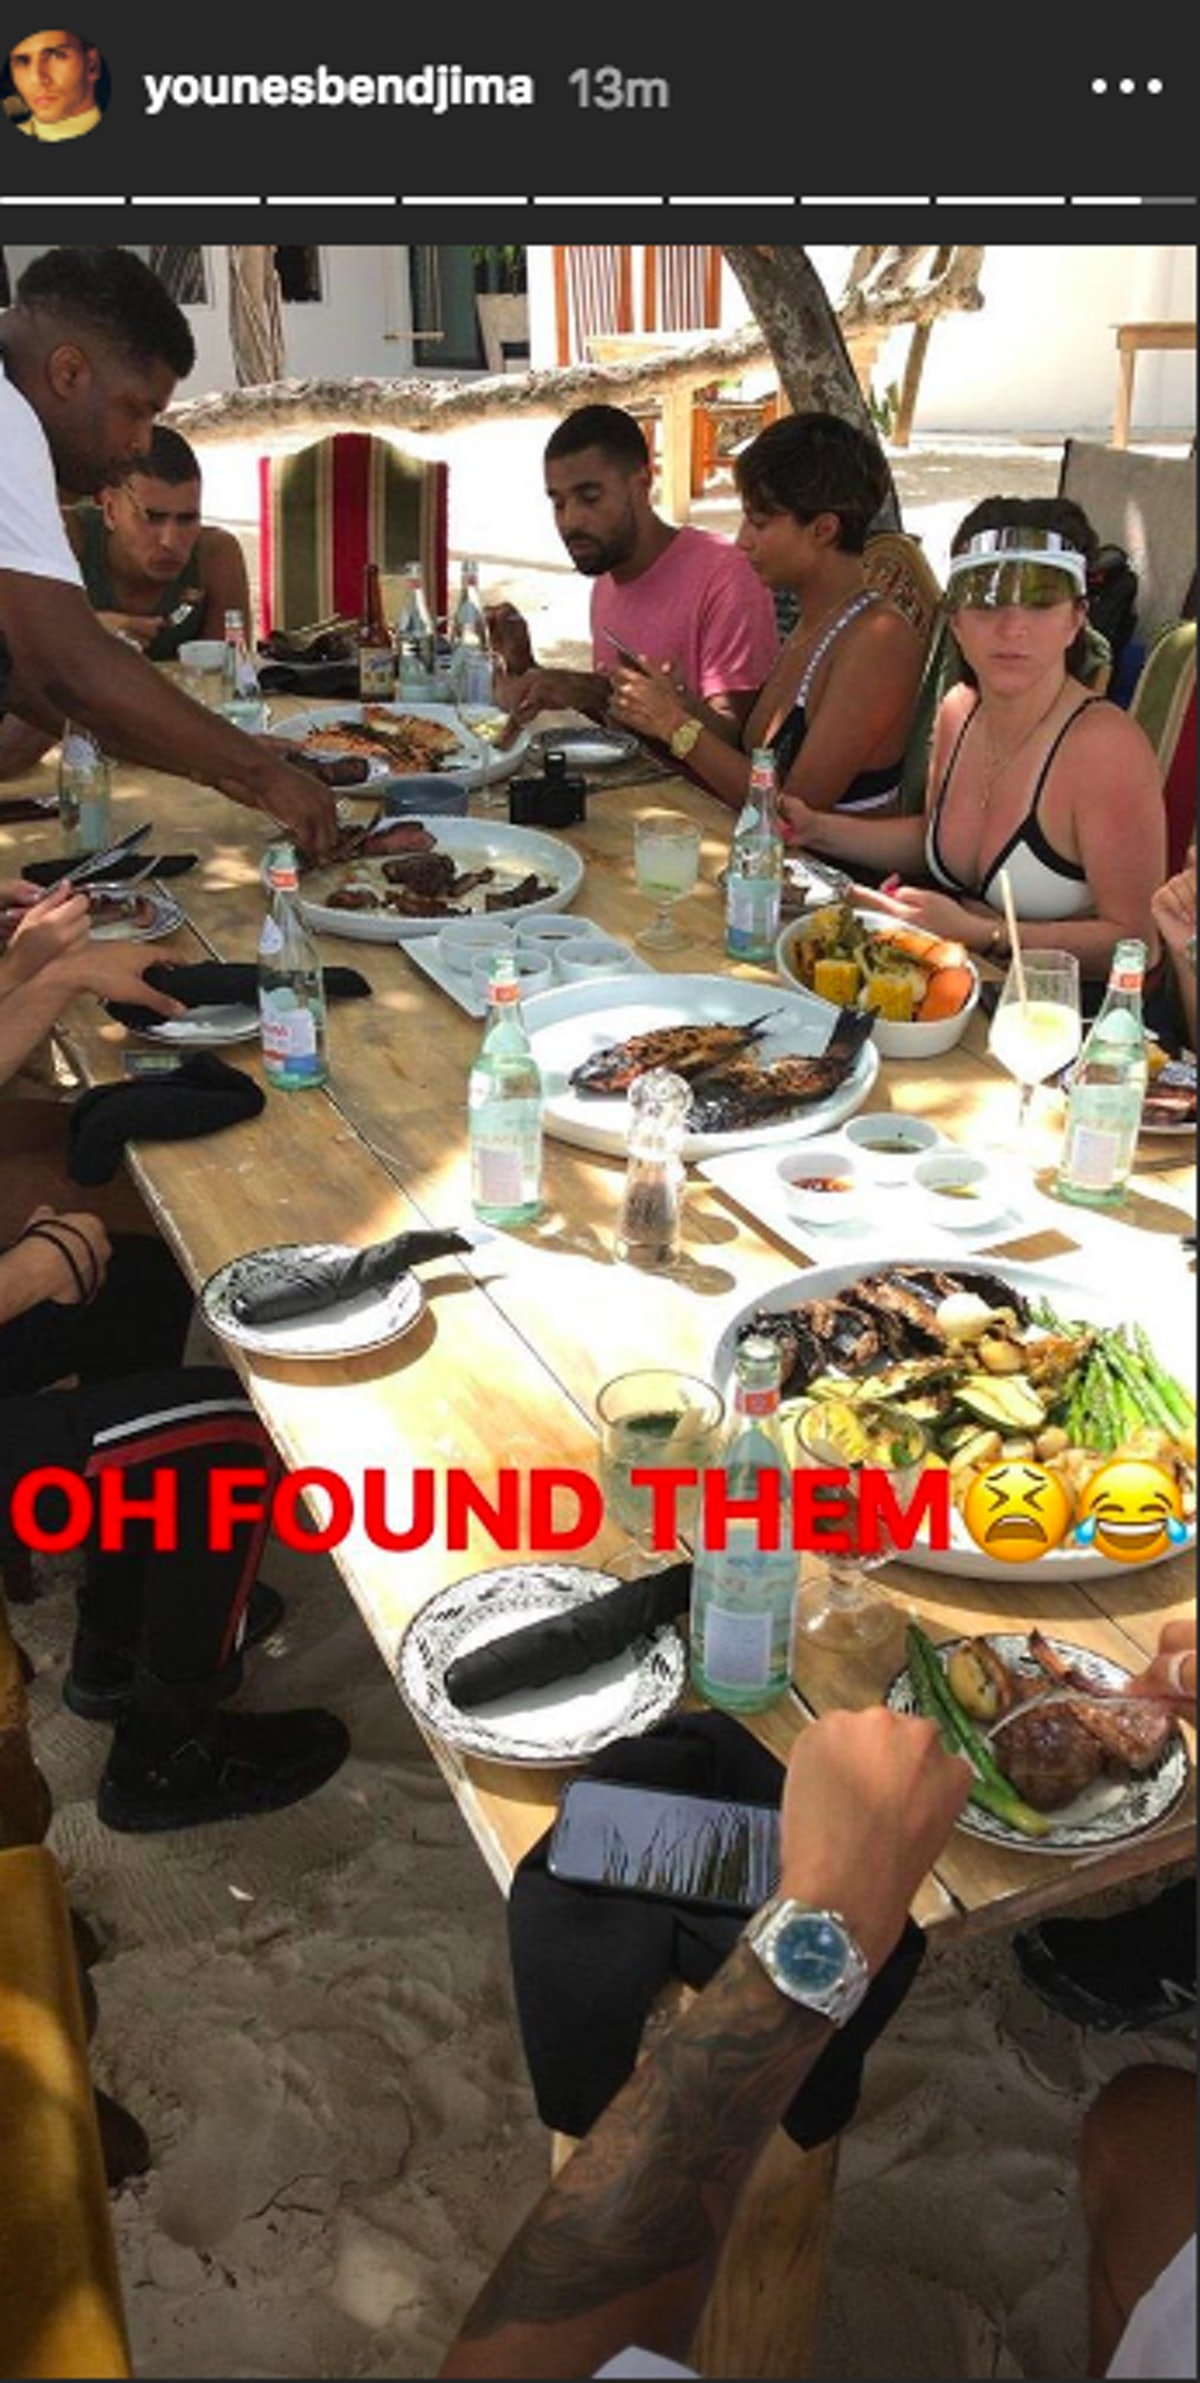 Kourtney Kardashian and Younes Bendjima breakup 1.png